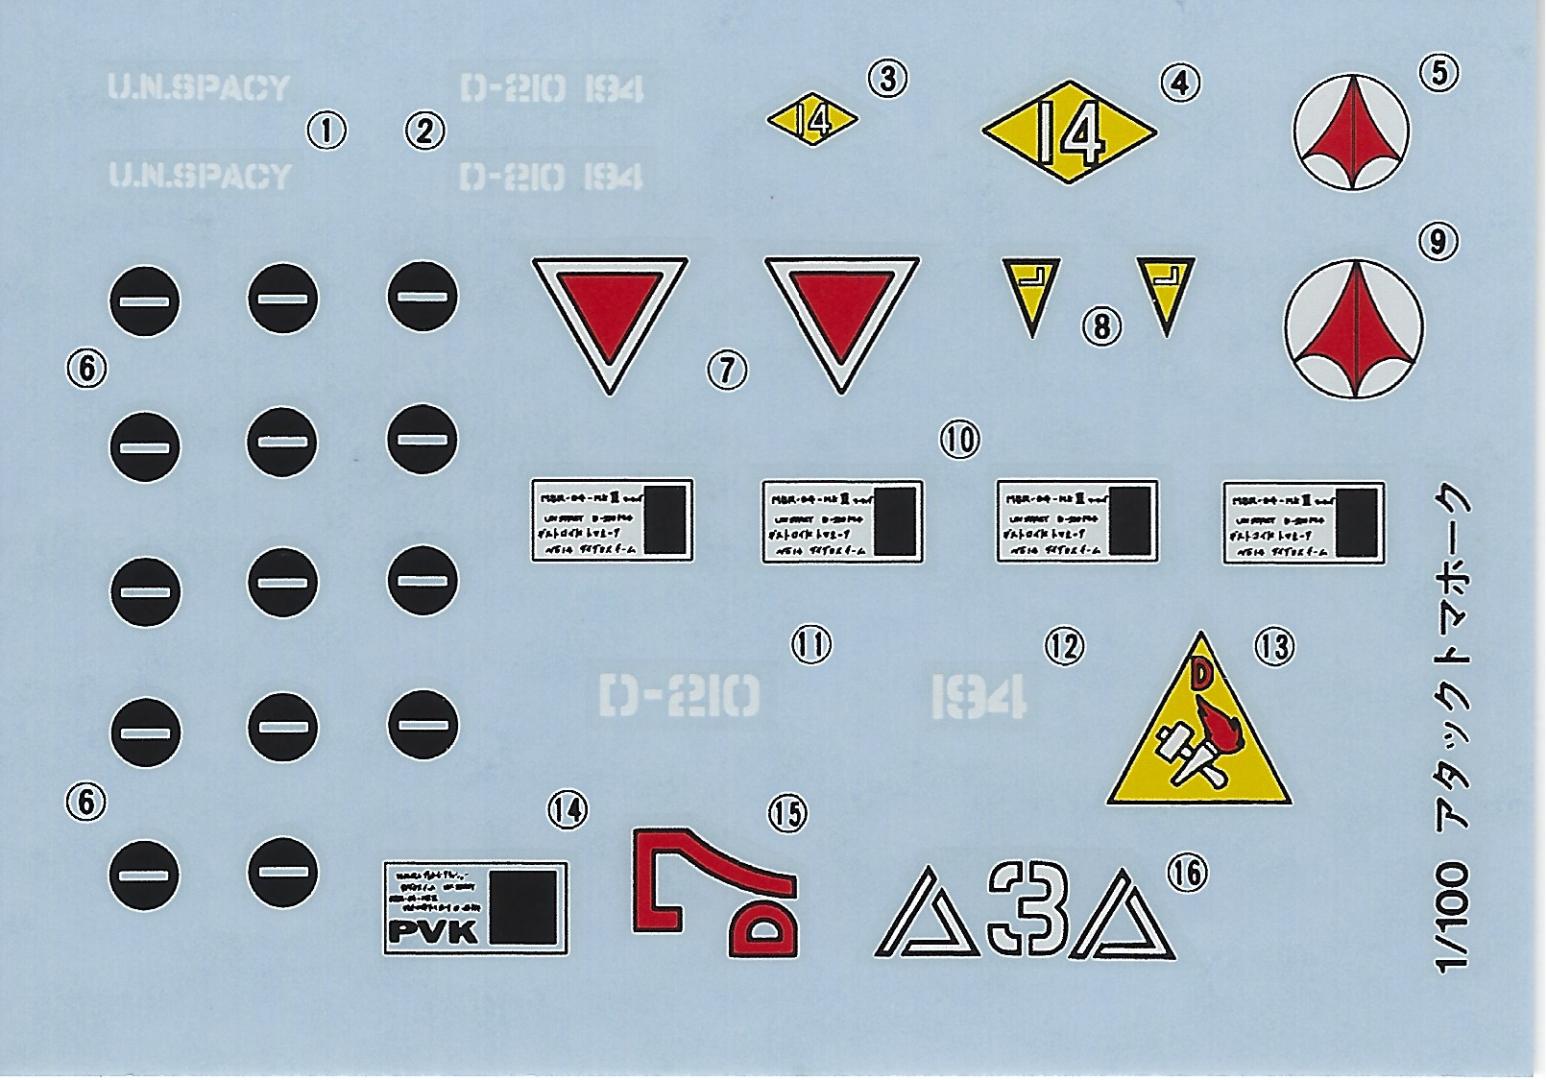 5b242016ef916_ArmoredFactory02600.thumb.png.fc6e5d3631435d405cc71aa918c687c8.png